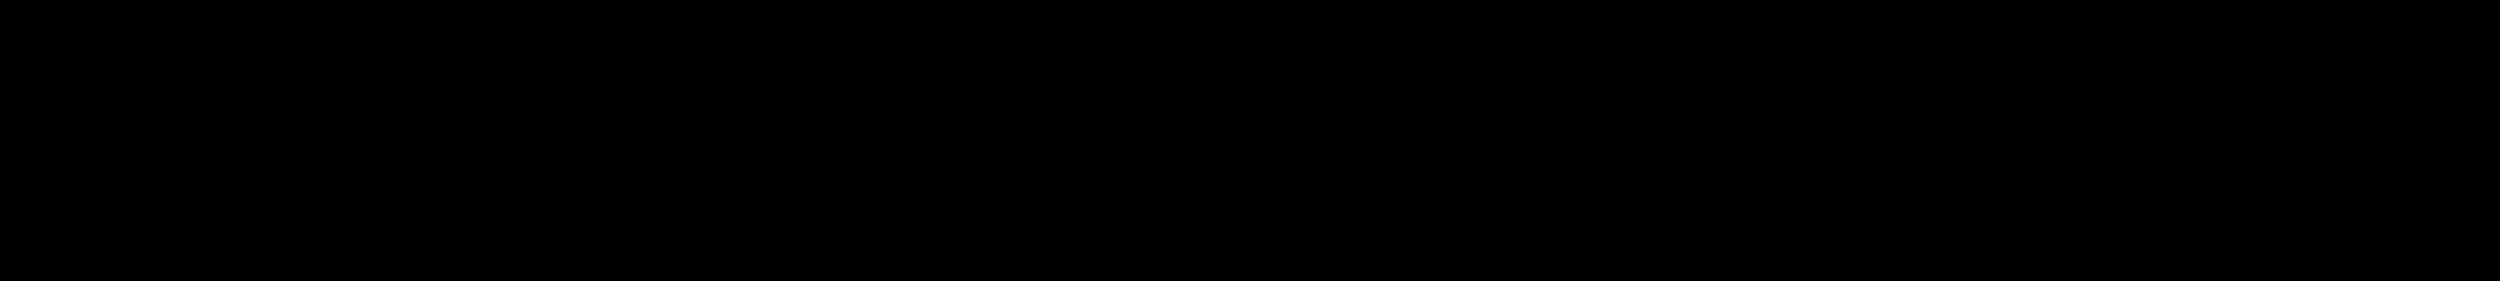 CarbonBlack-Logo-Primary-RGBBlack.png